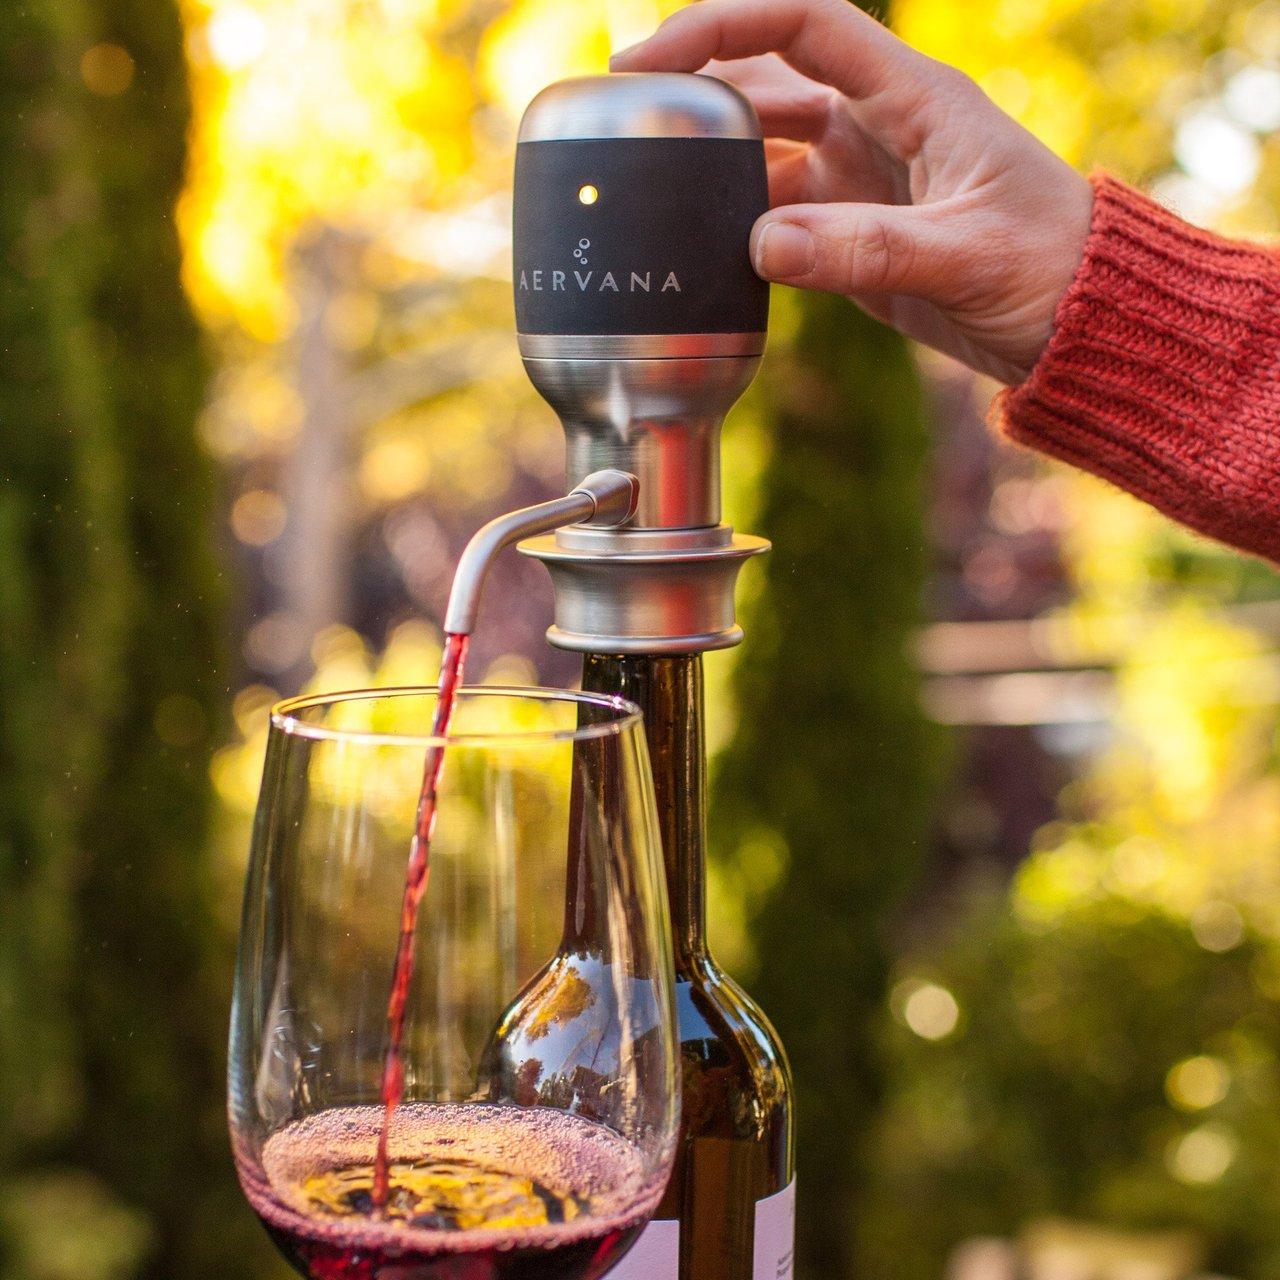 Aervana One-Touch Luxury Wine Aerator